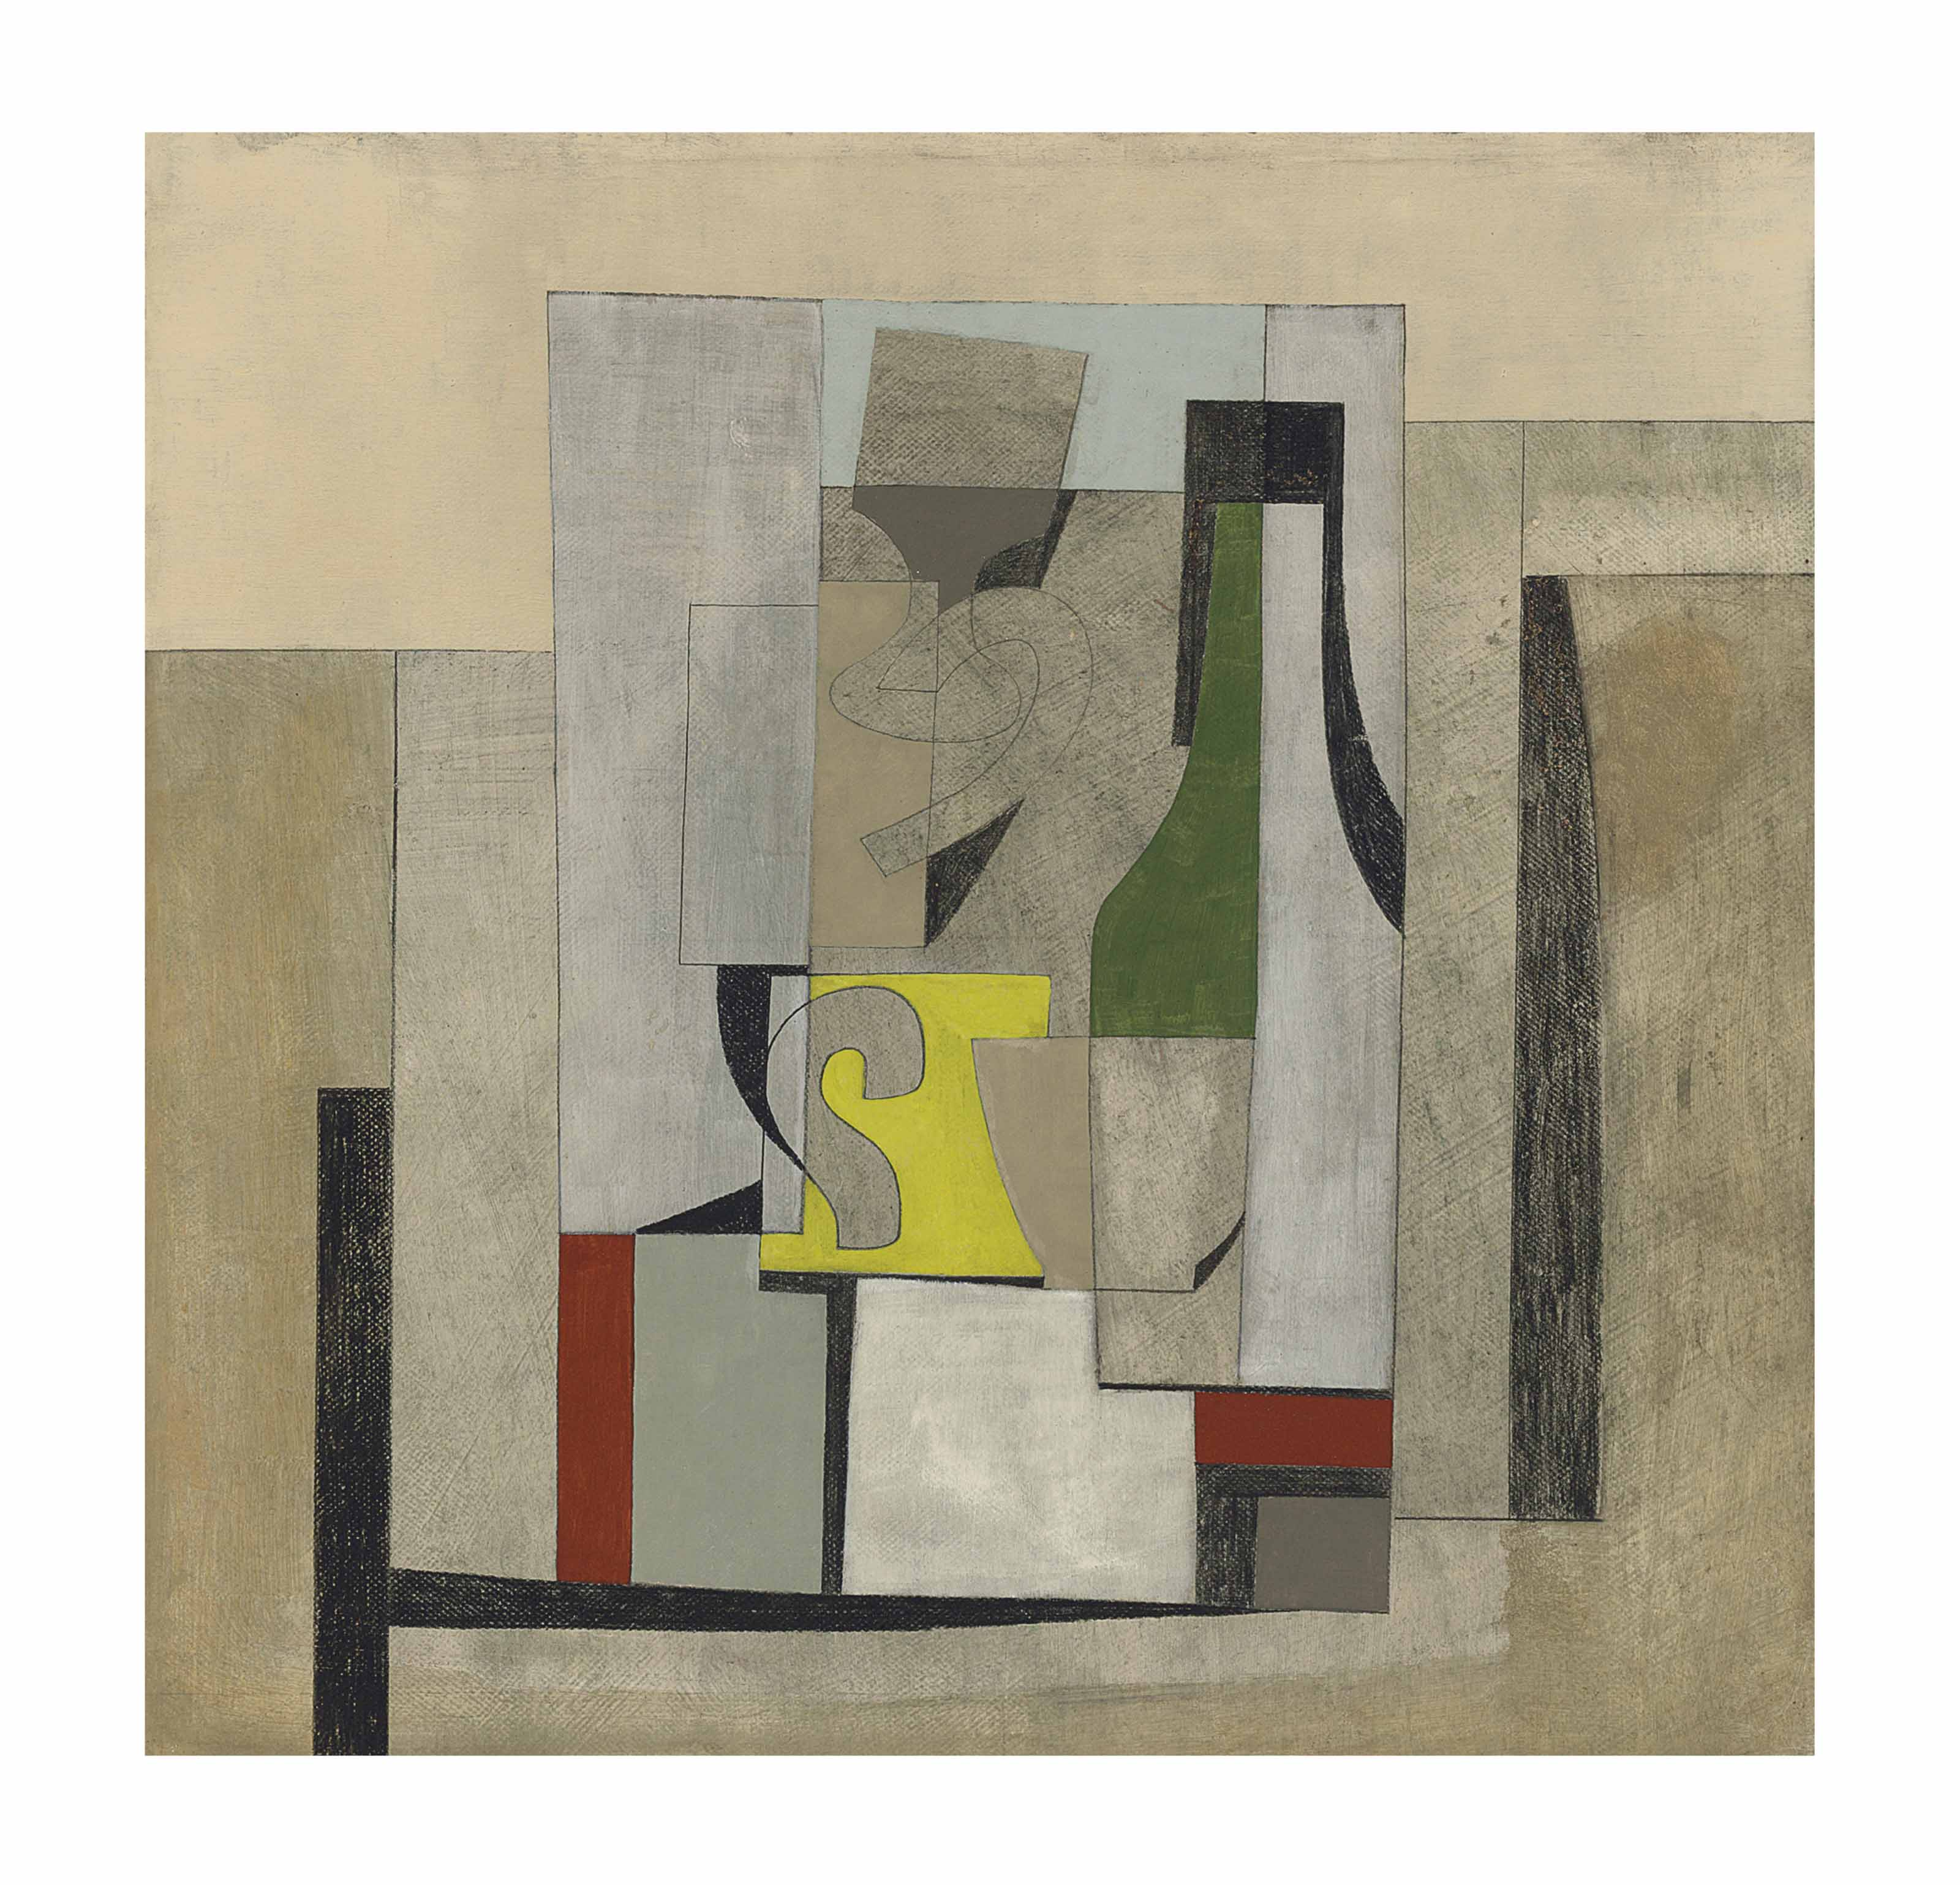 Ben Nicholson, O.M. (1894-1982)